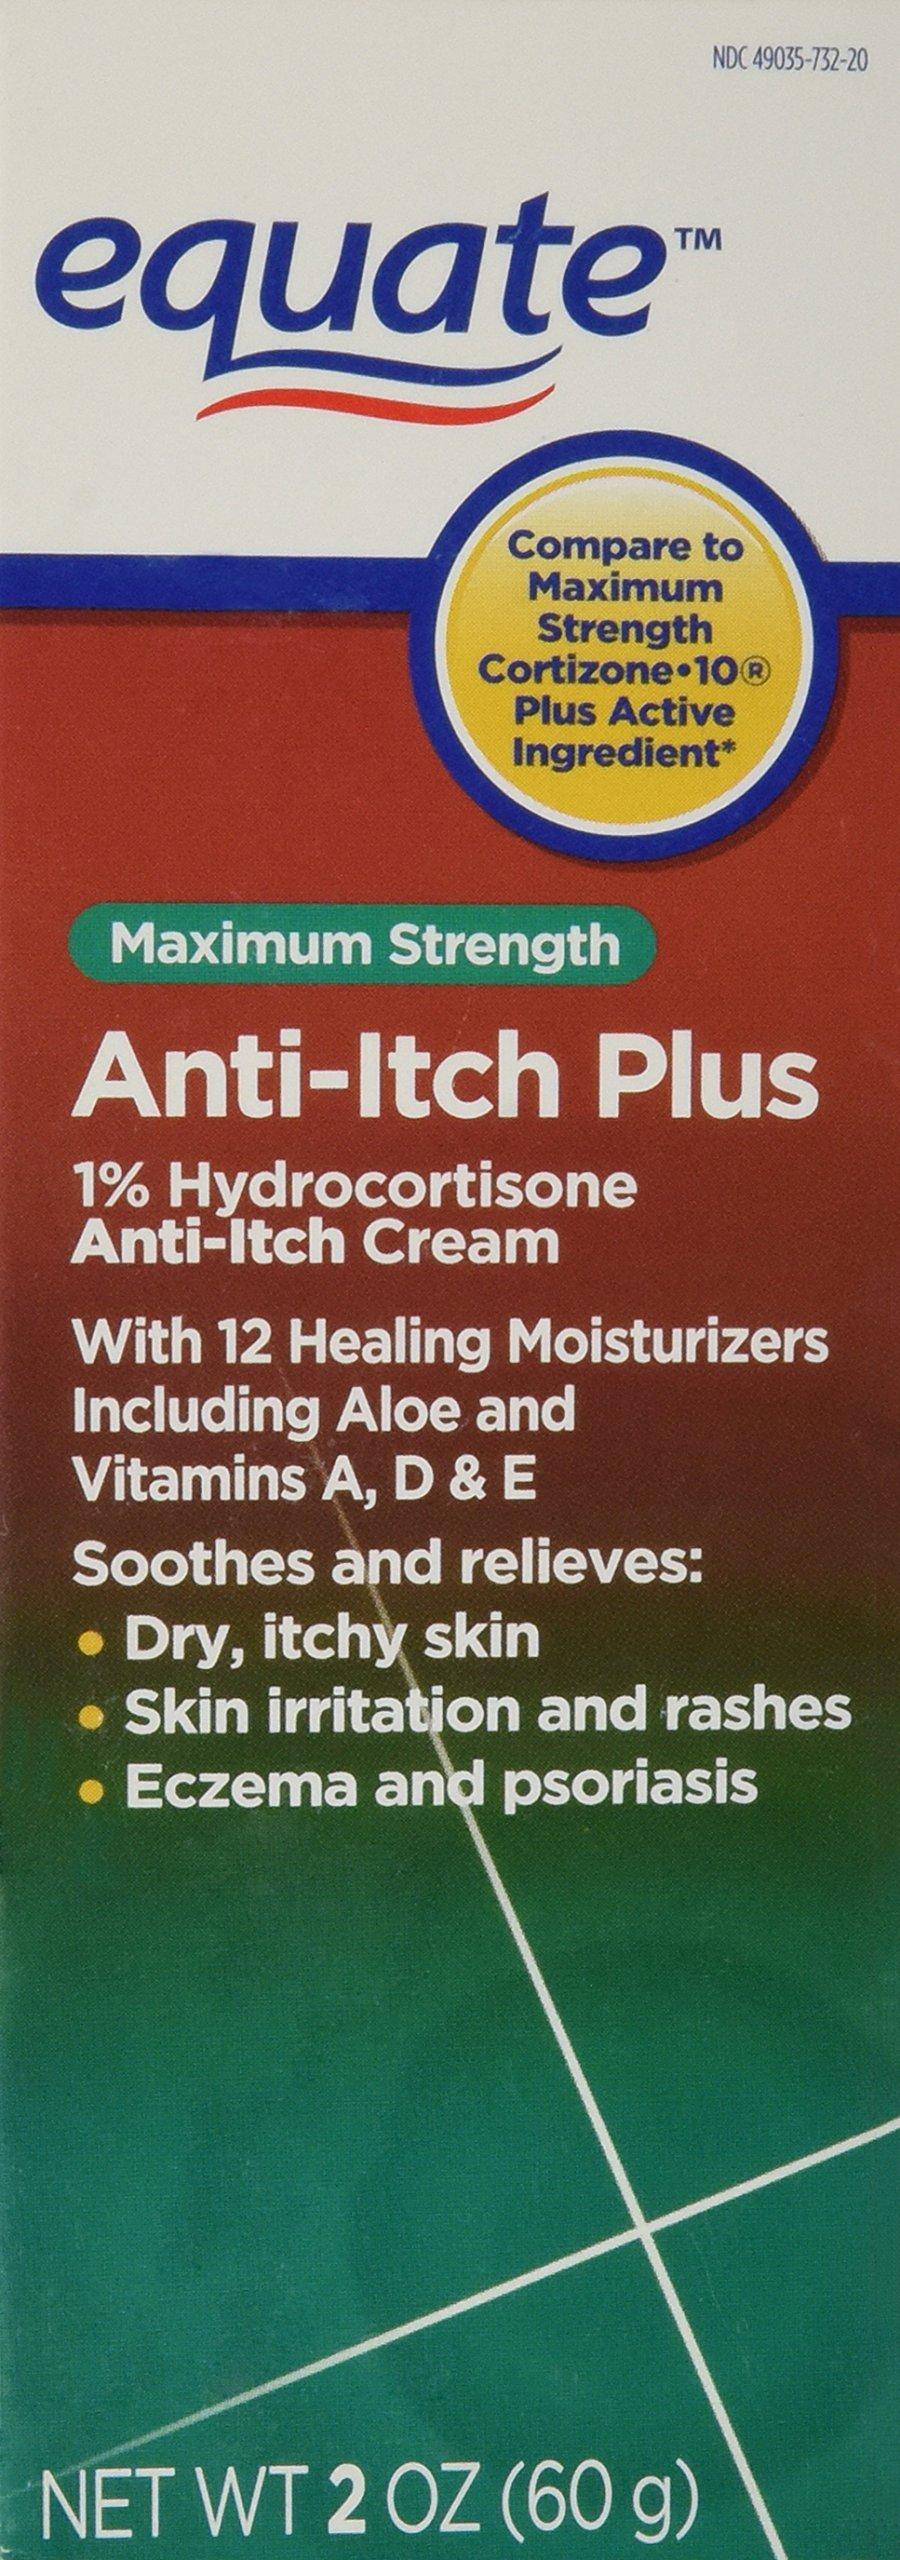 Equate - Anti-Itch Plus Cream, Hydrocortisone 1%, Maximum Strength, 2 oz (Compare to Cortizone-10). by Equate